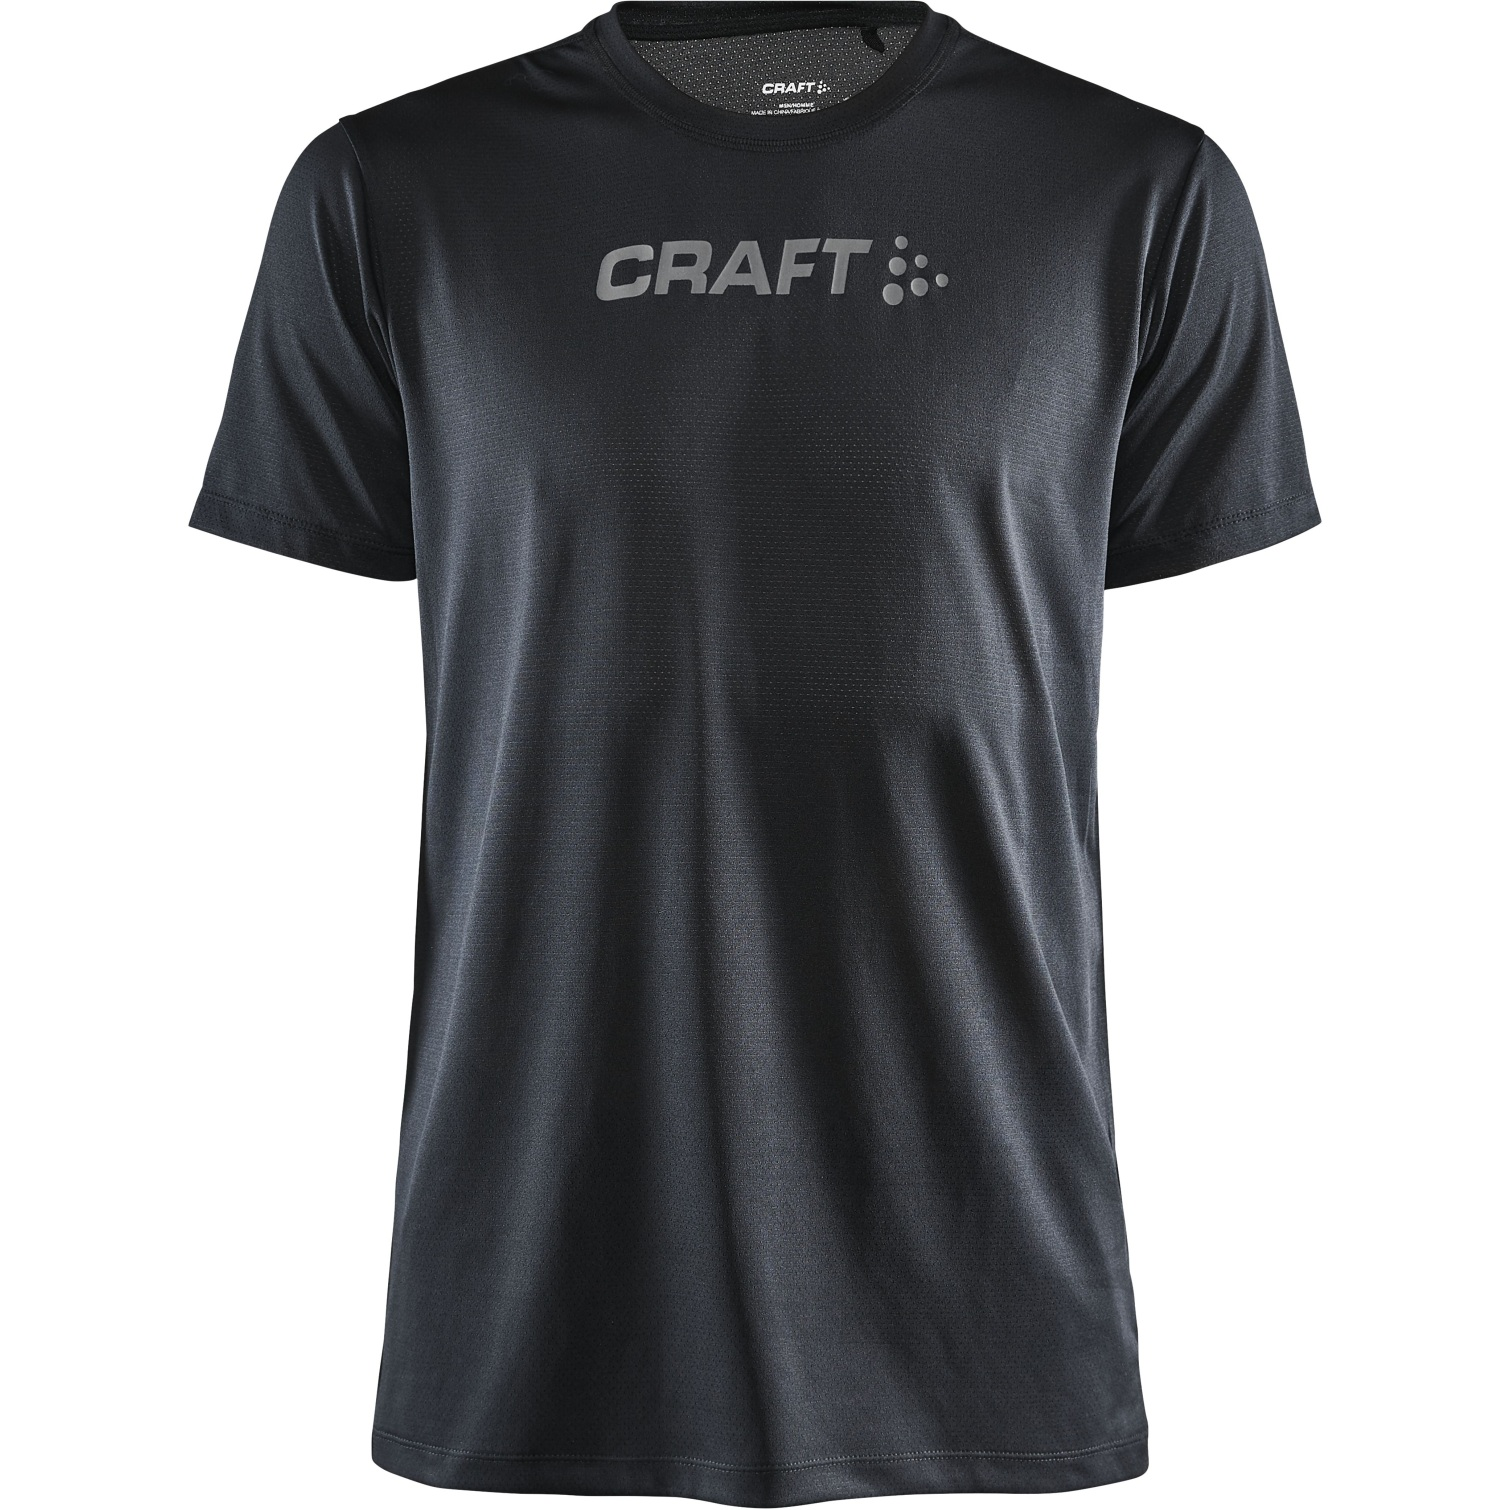 CRAFT Core Essence Mesh Men's T-Shirt 1908786 - 999000 Black